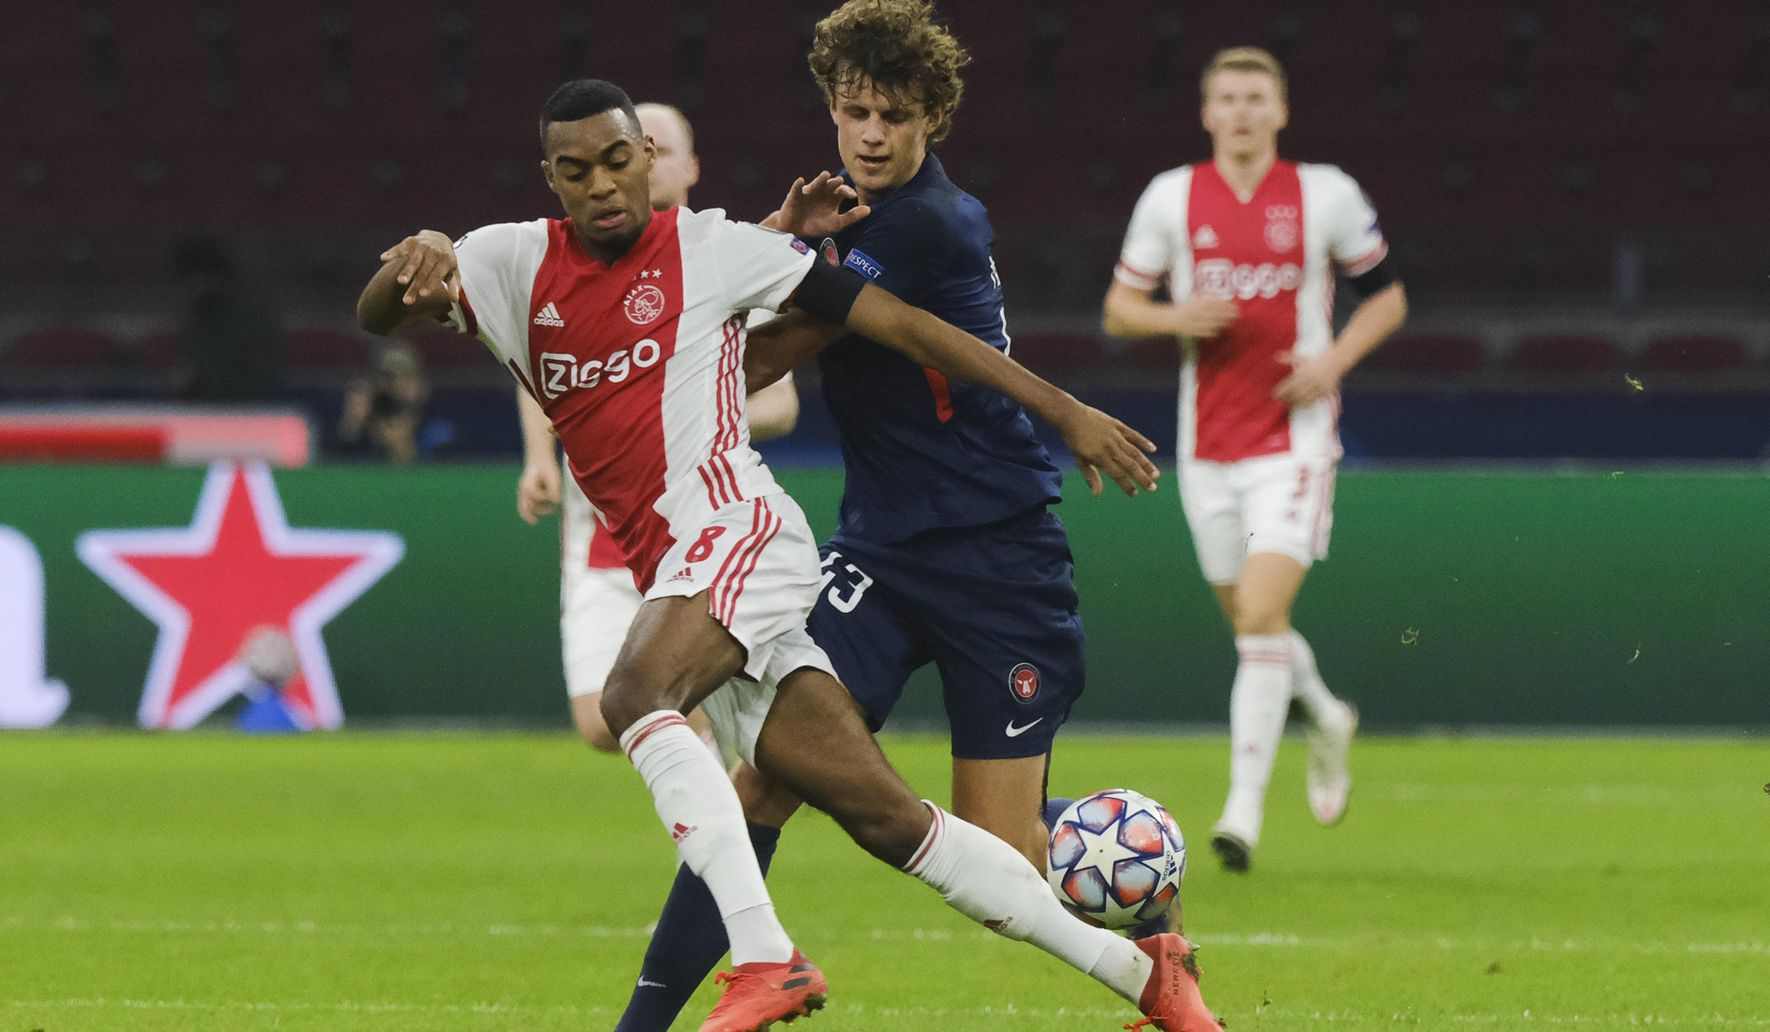 Netherlands_soccer_champions_league_35609_c0-185-4416-2759_s1770x1032